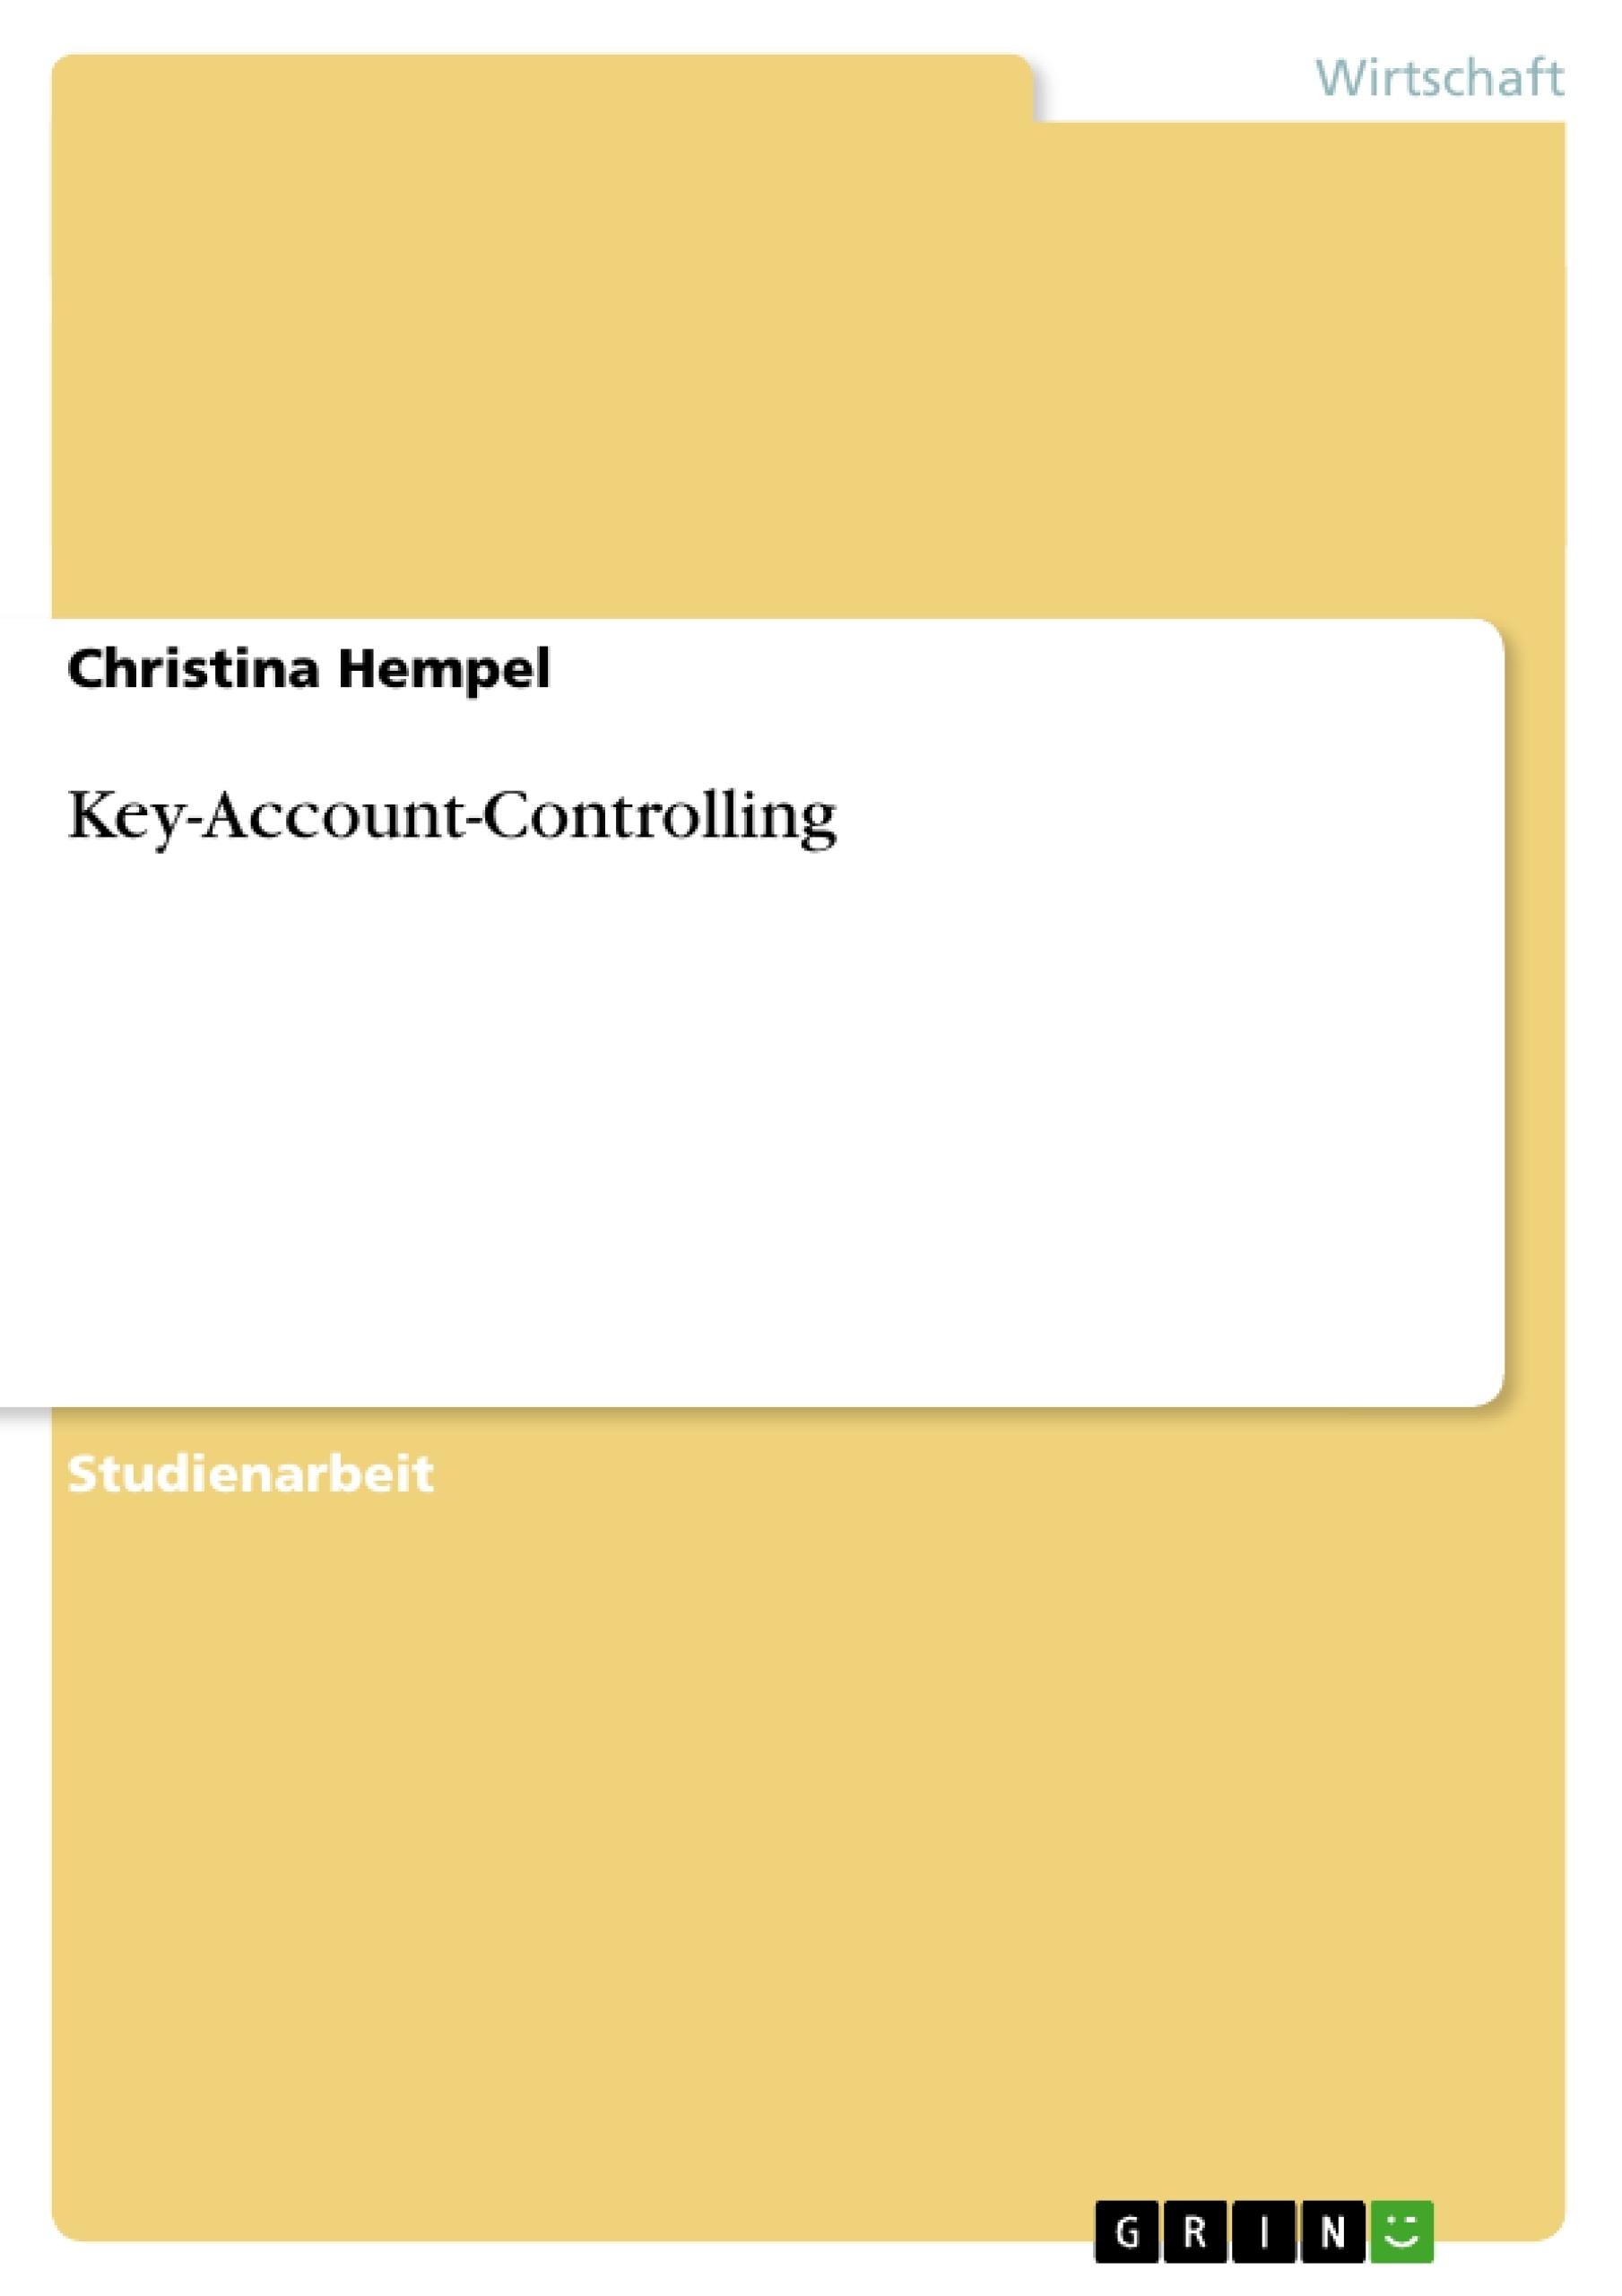 Titel: Key-Account-Controlling